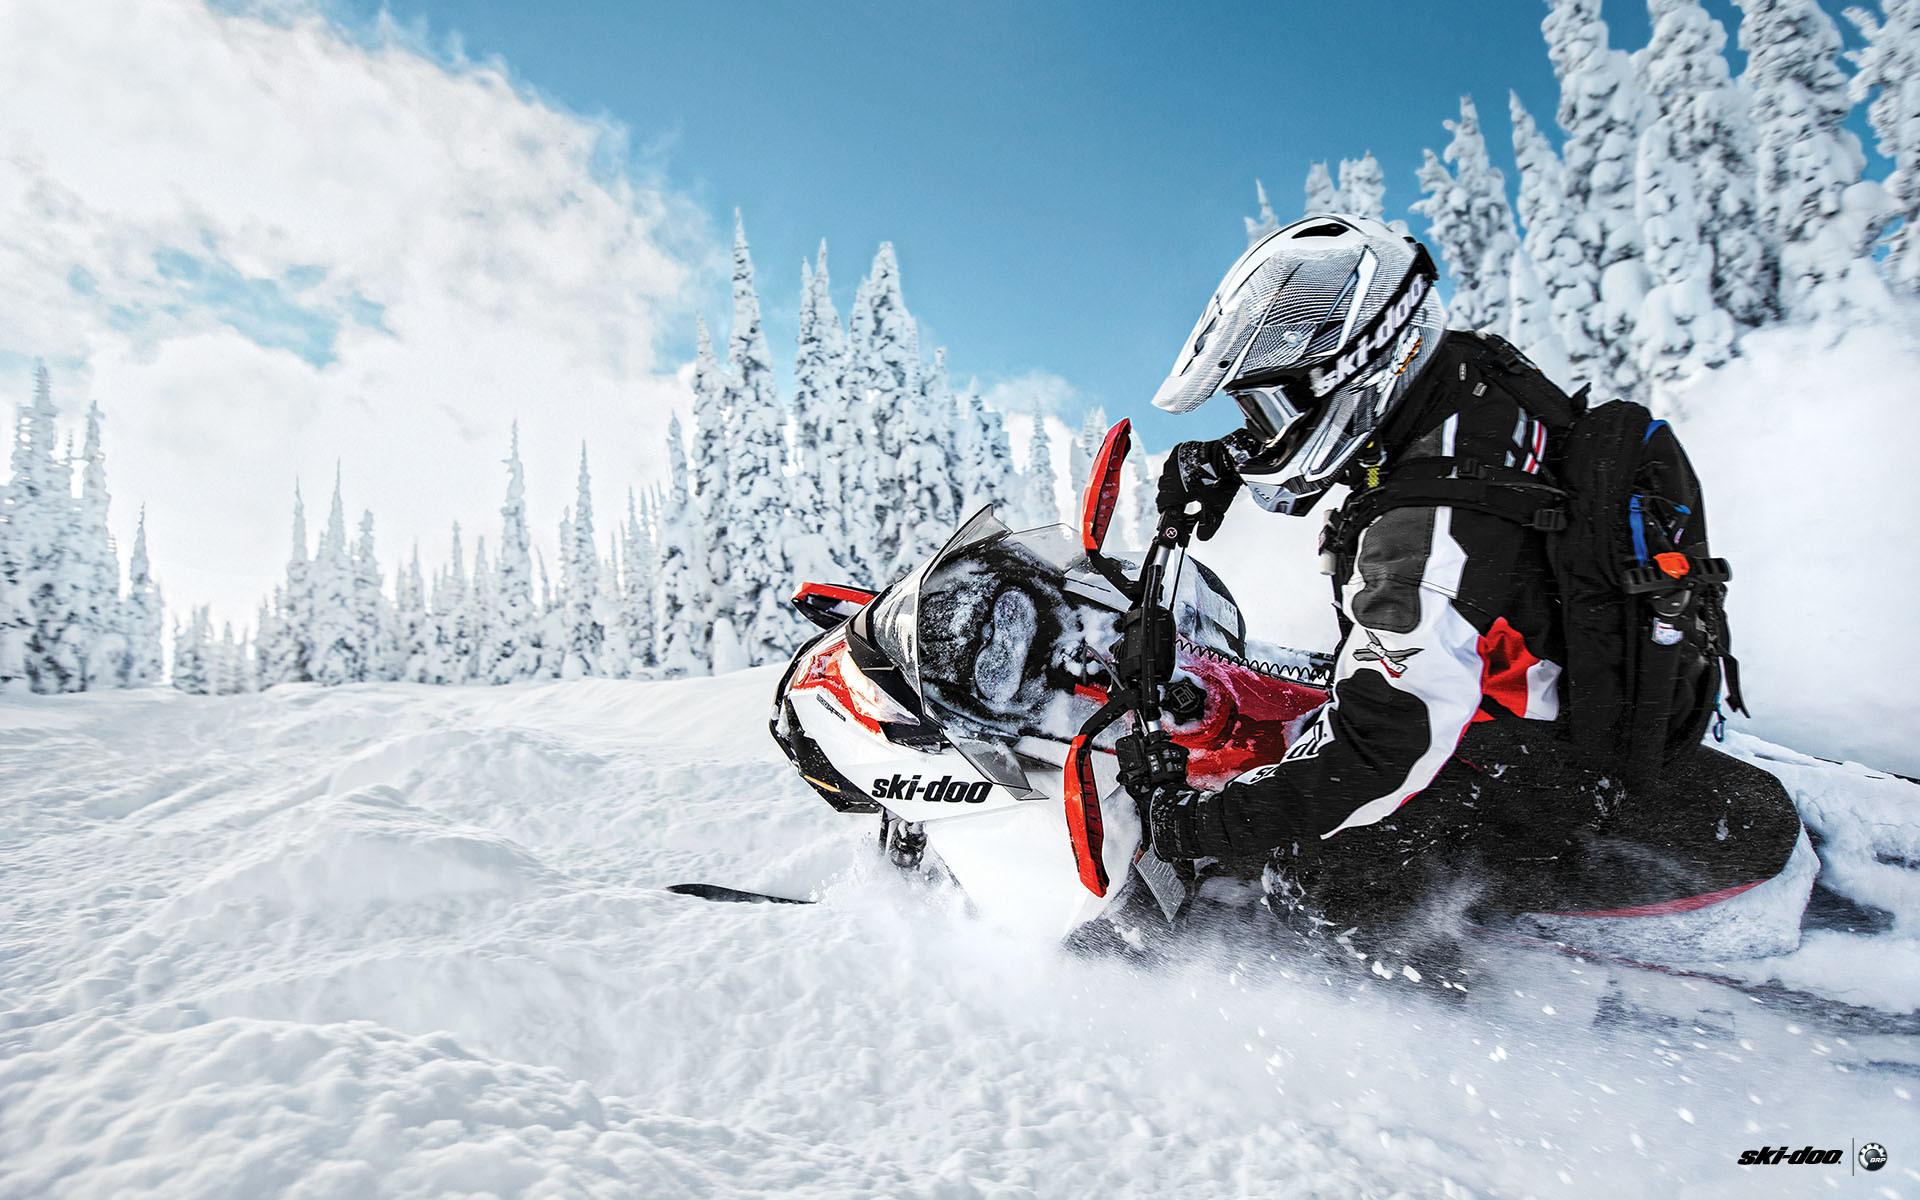 Polaris RMK – I Get An Adrenaline Rush Just Looking At It! | Toys |  Pinterest | Snow machine, Dirt biking and Ford jokes